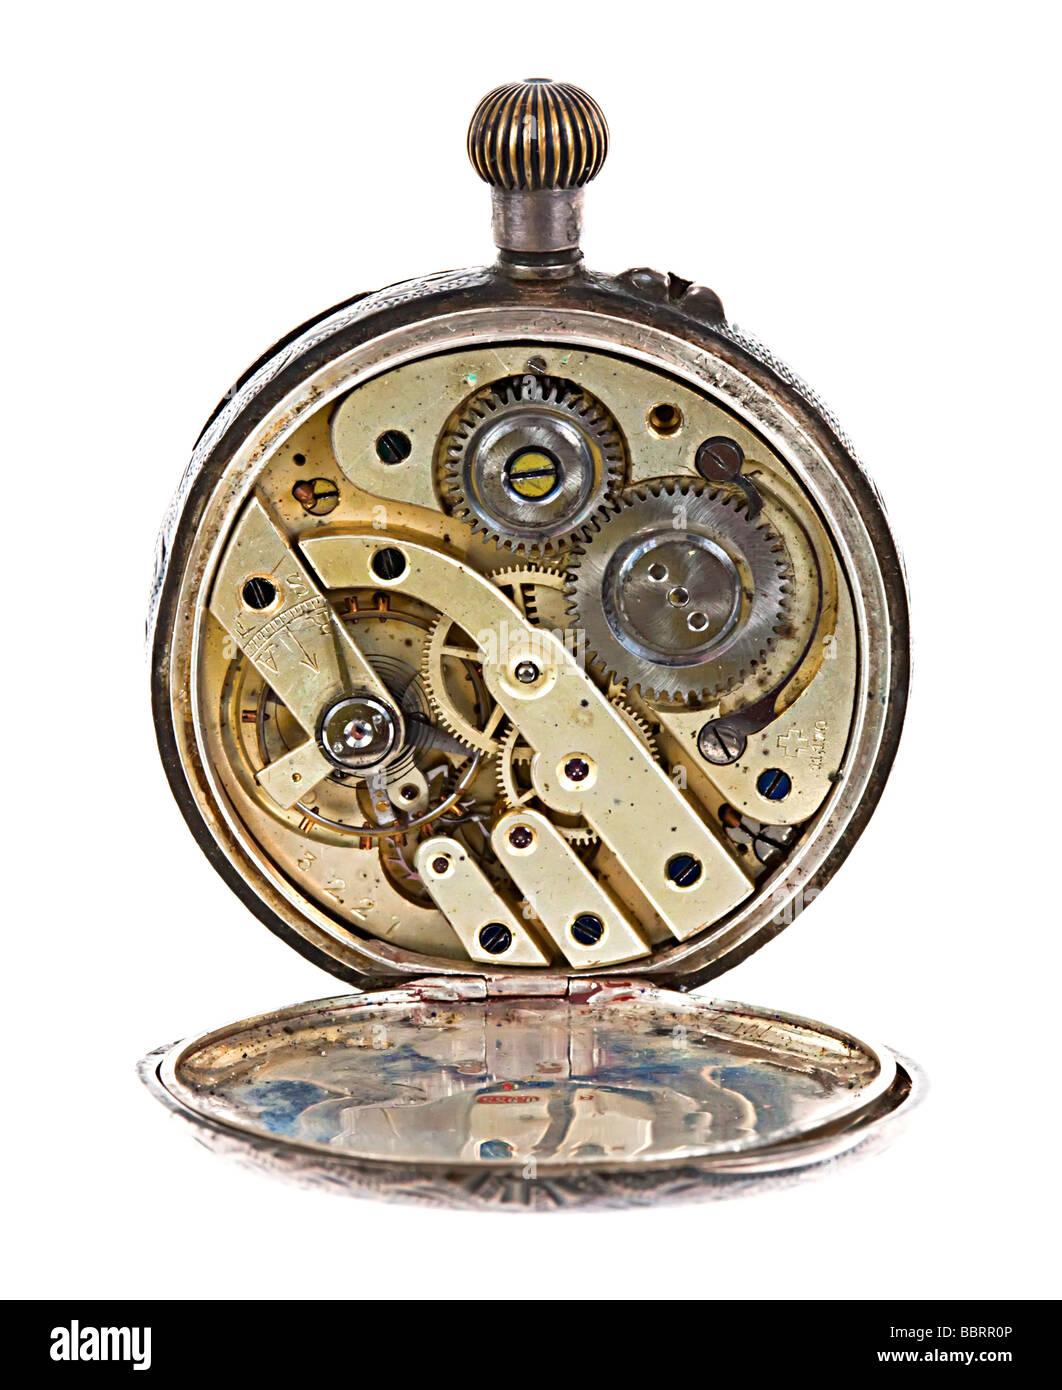 Antique pocket watch movement UK - Stock Image